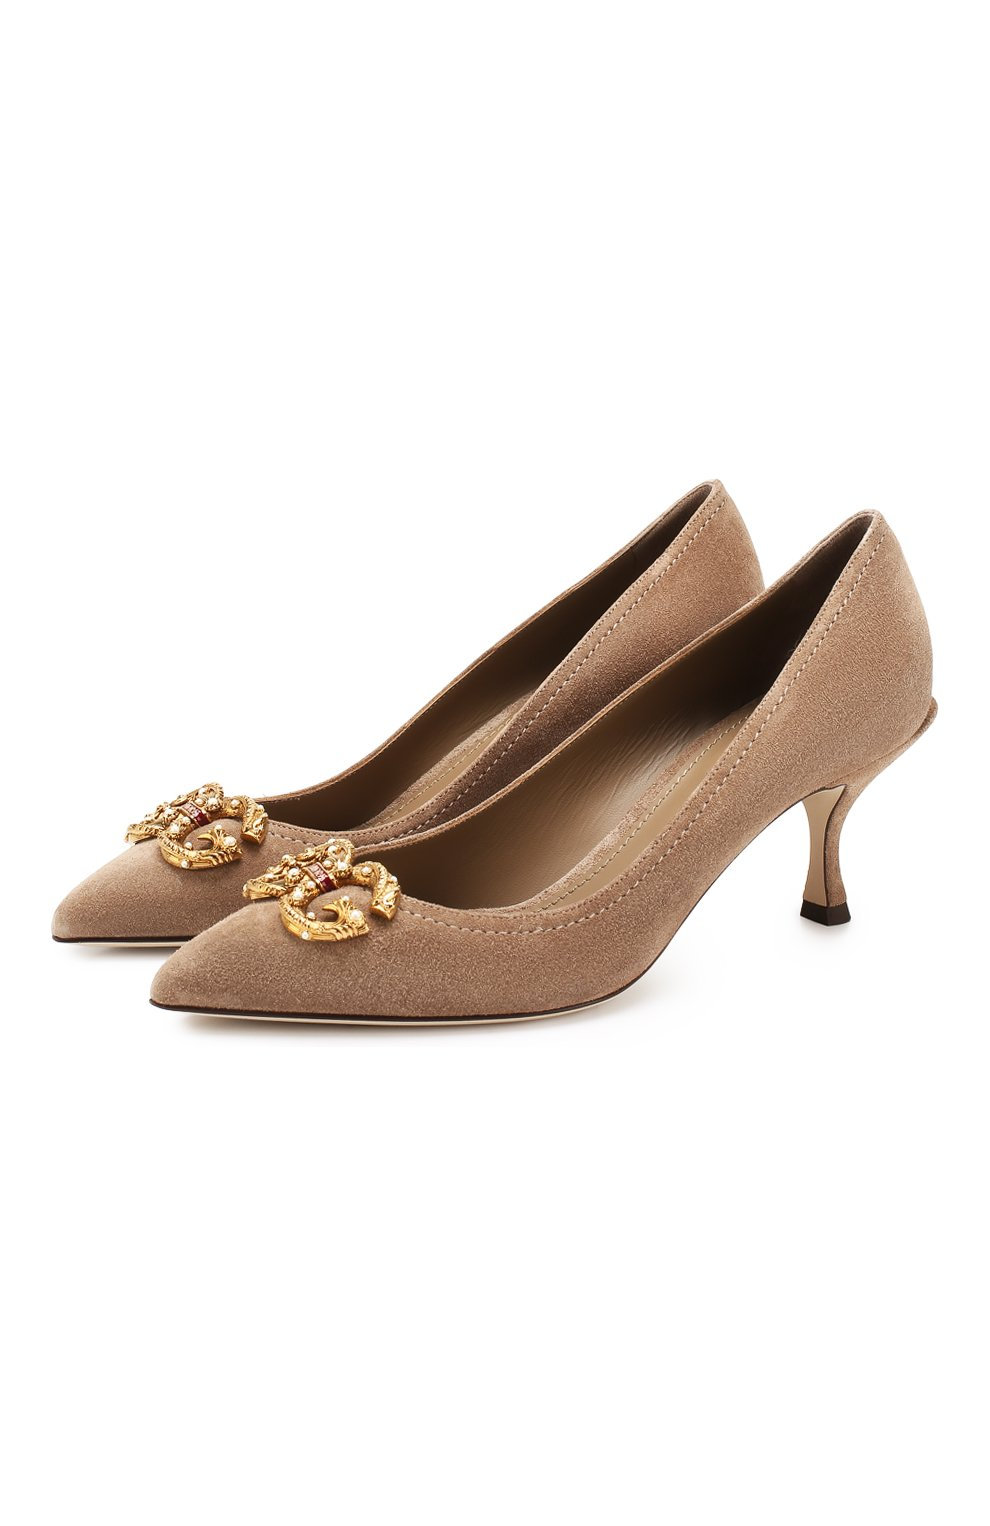 Замшевые туфли Lori | Фото №1